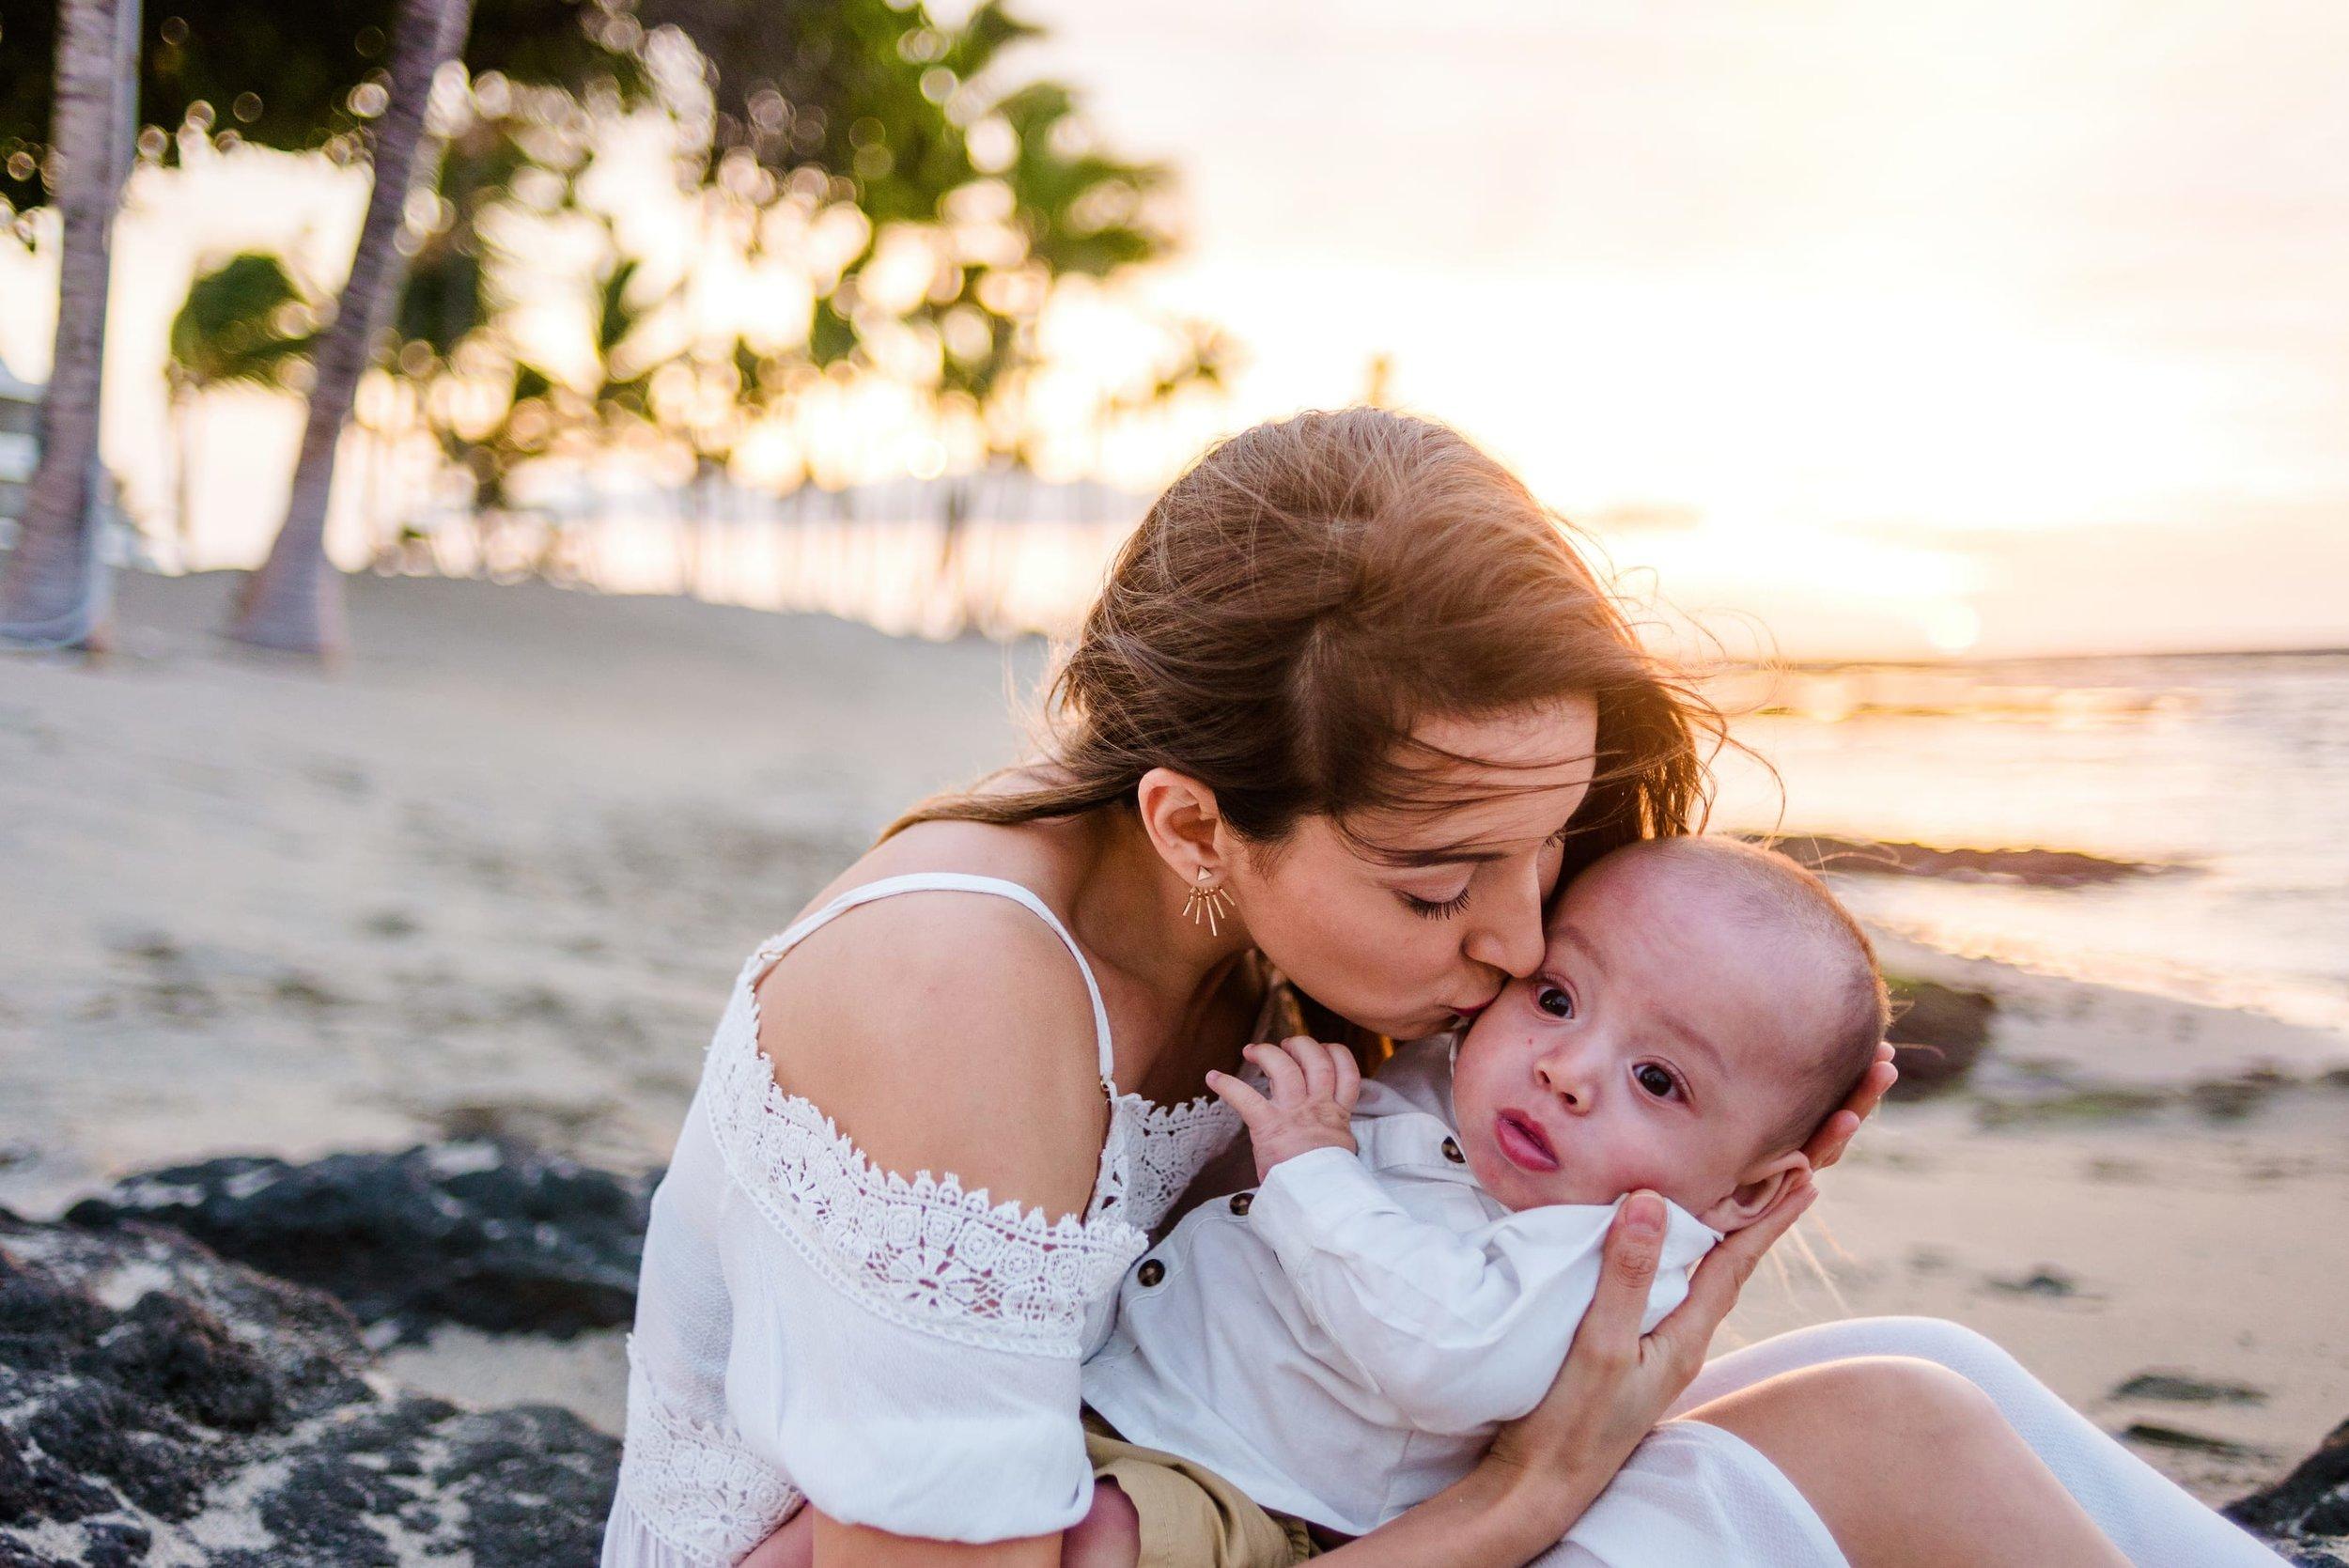 Waikoloa-Child-Photographer-Kona-Vacation-06.jpg